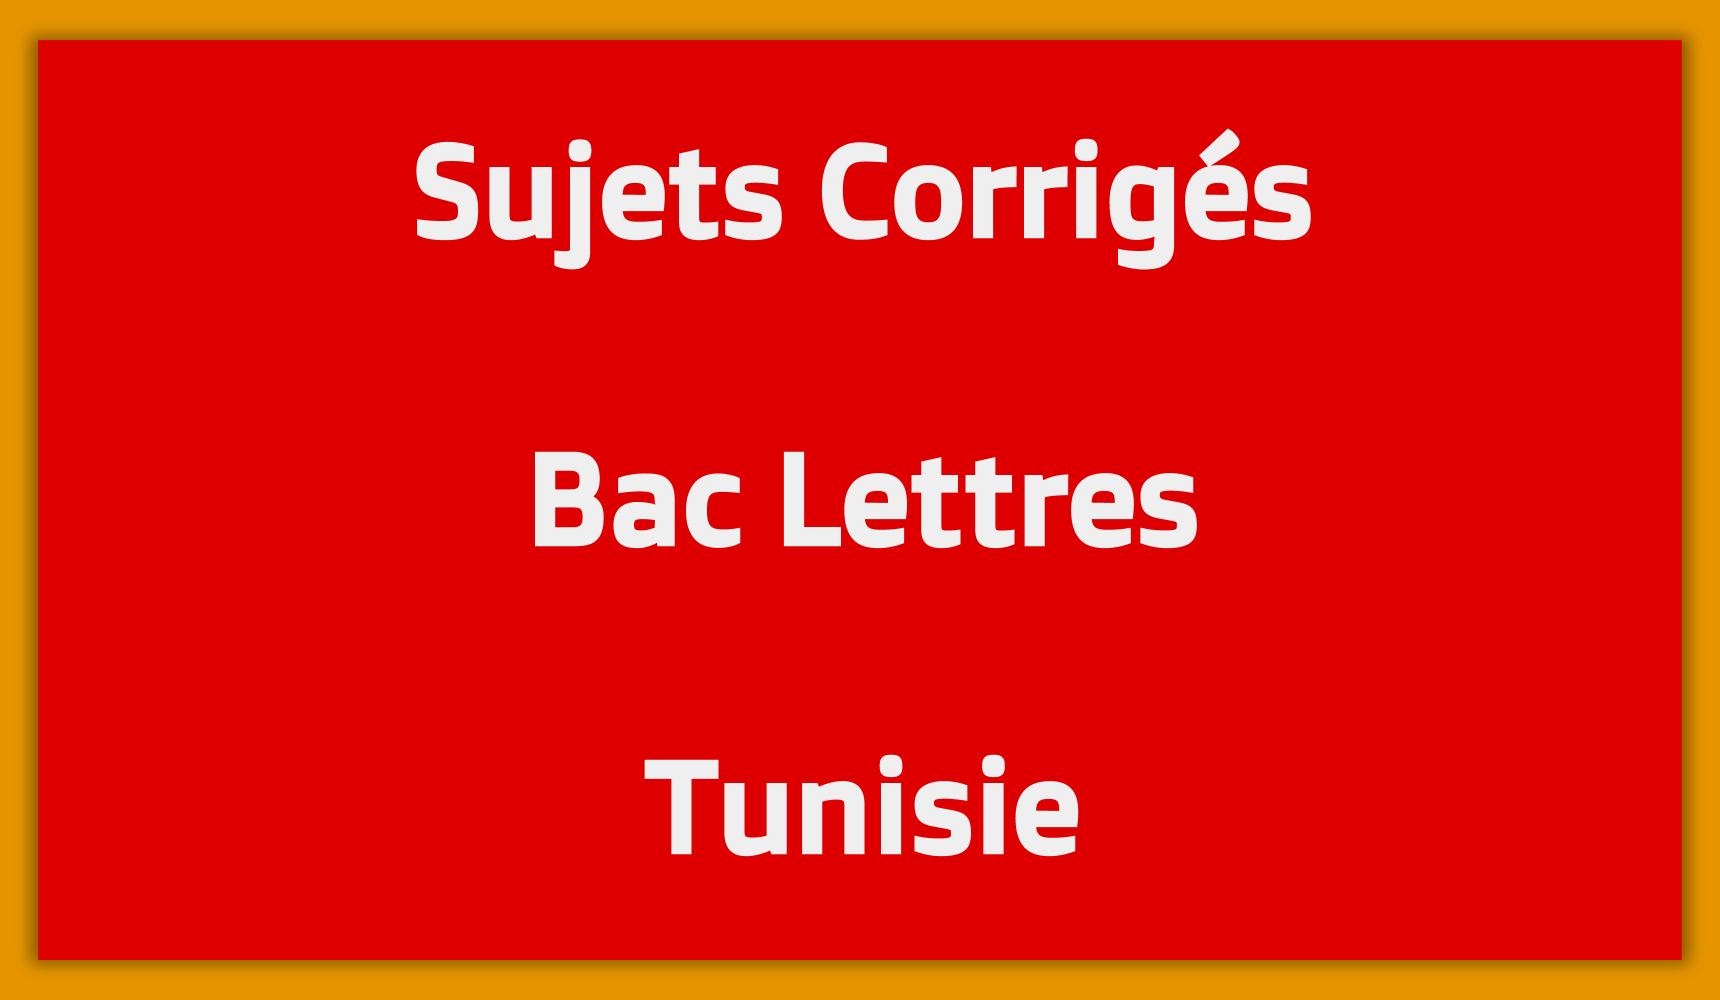 Telecharger Sujets Corriges Bac Lettres Tunisie Mon Bac